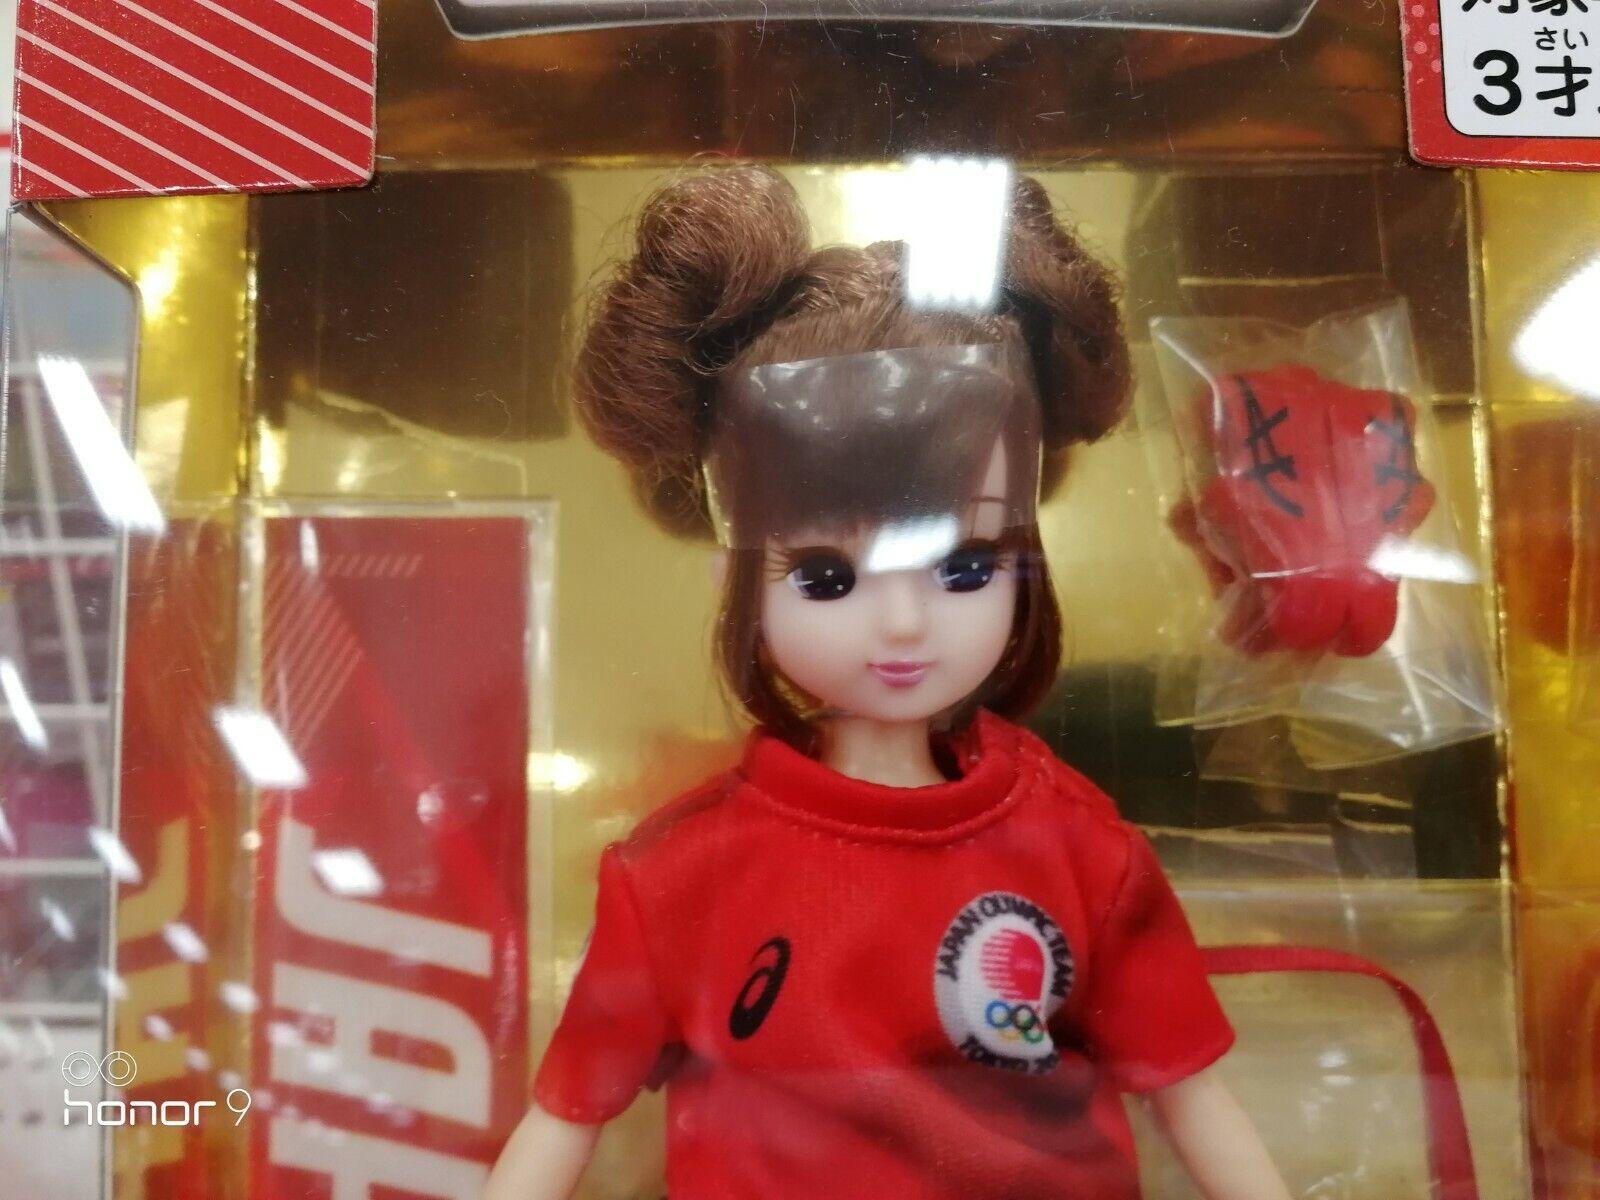 TAKARA TOMY Licca doll JOC OFFICIAL LICENSED PRODUCT Supporter TOKYO 2020 Japan